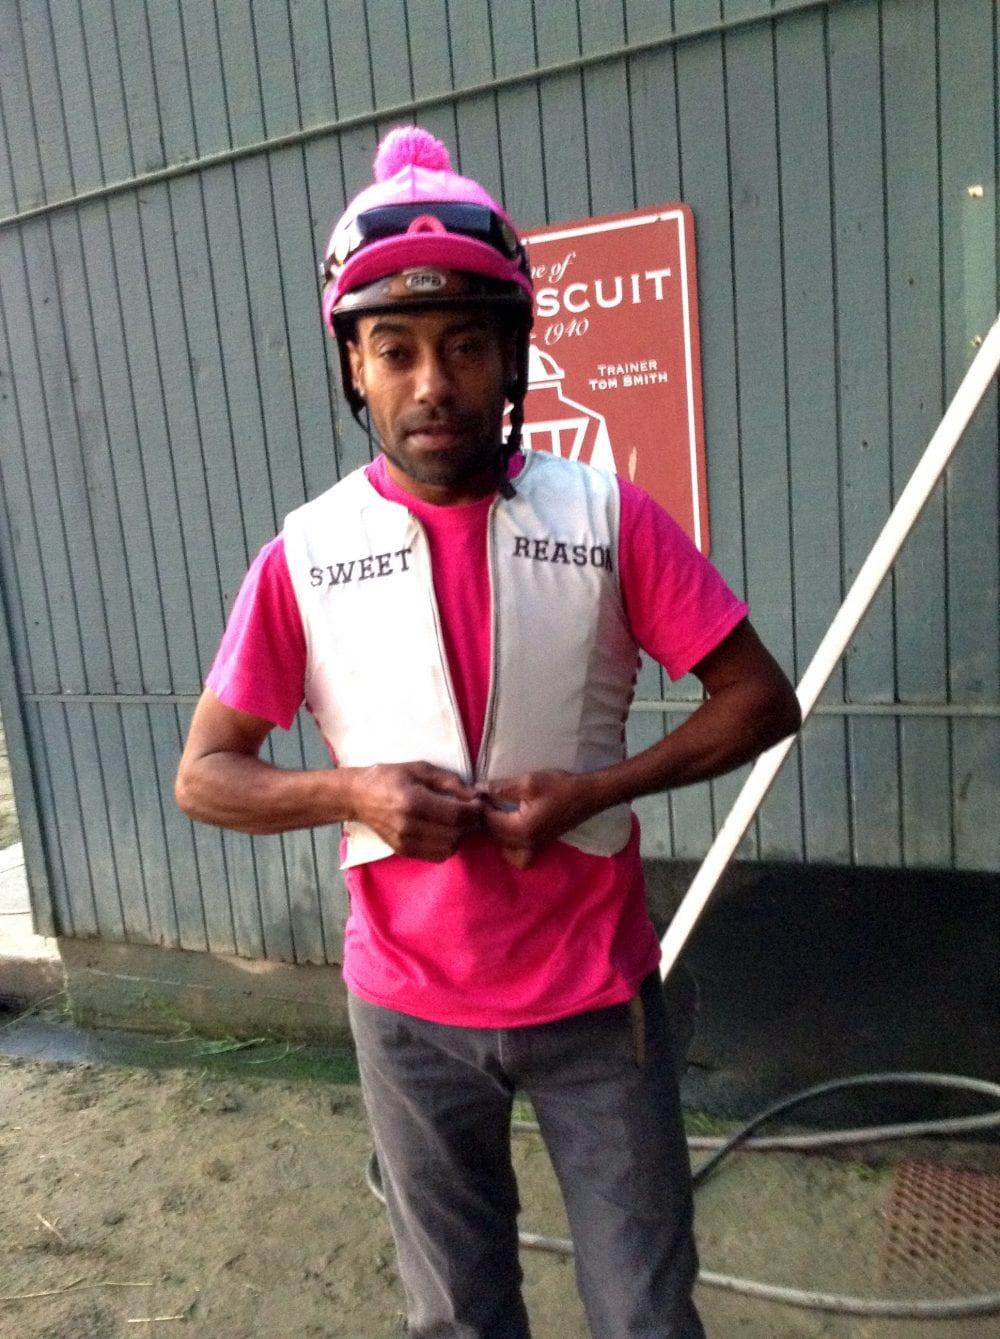 NYTHA Offering Exercise Riders $125 Each For Safer Helmet